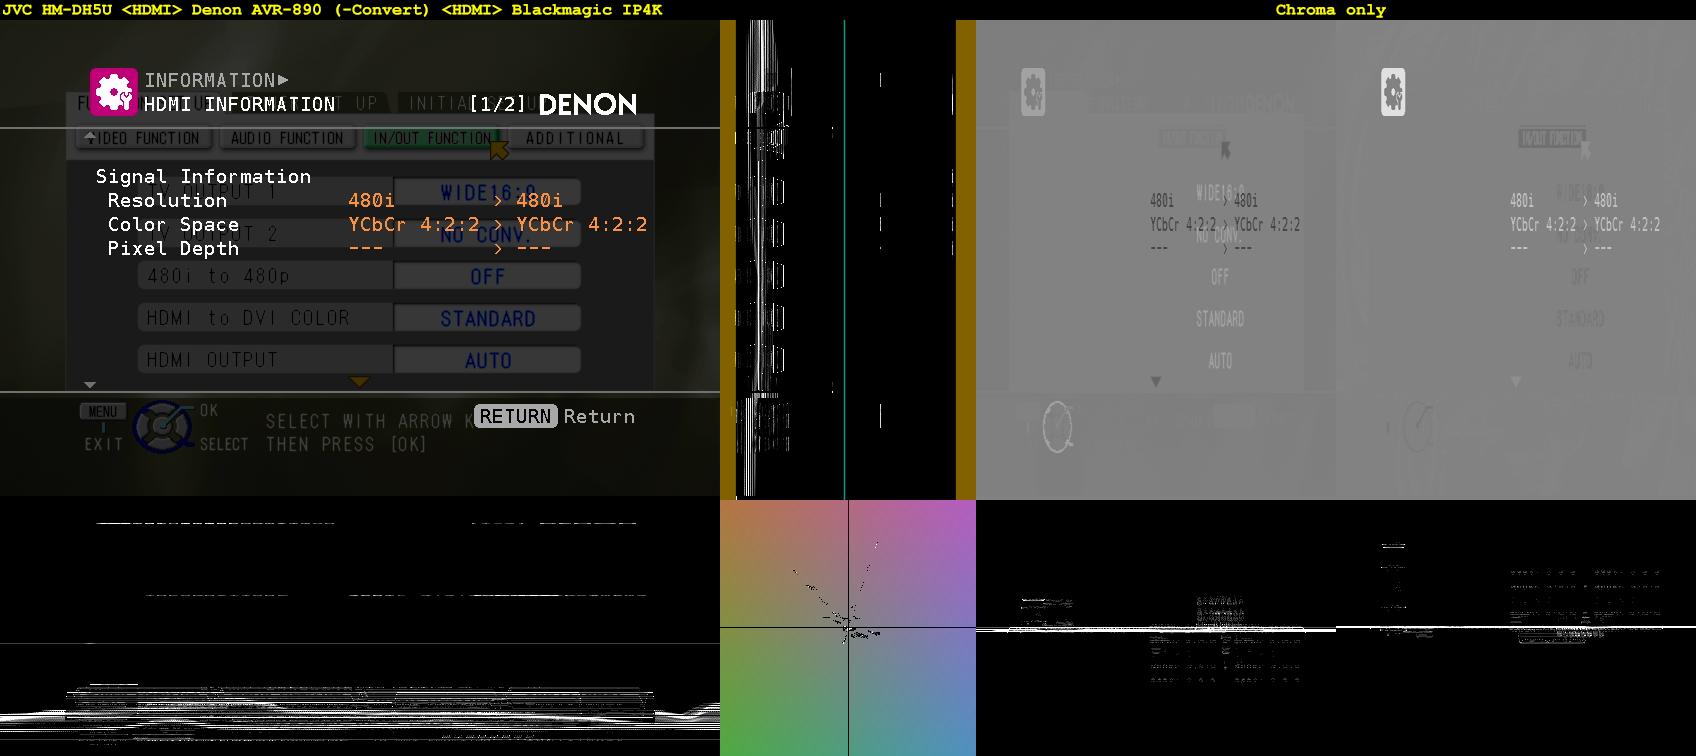 Click image for larger version  Name:Menu + Info - JVC HM-DH5U =HDMI= Denon AVR-890, -Convert =HDMI= IP4K.png Views:3127 Size:271.2 KB ID:35273